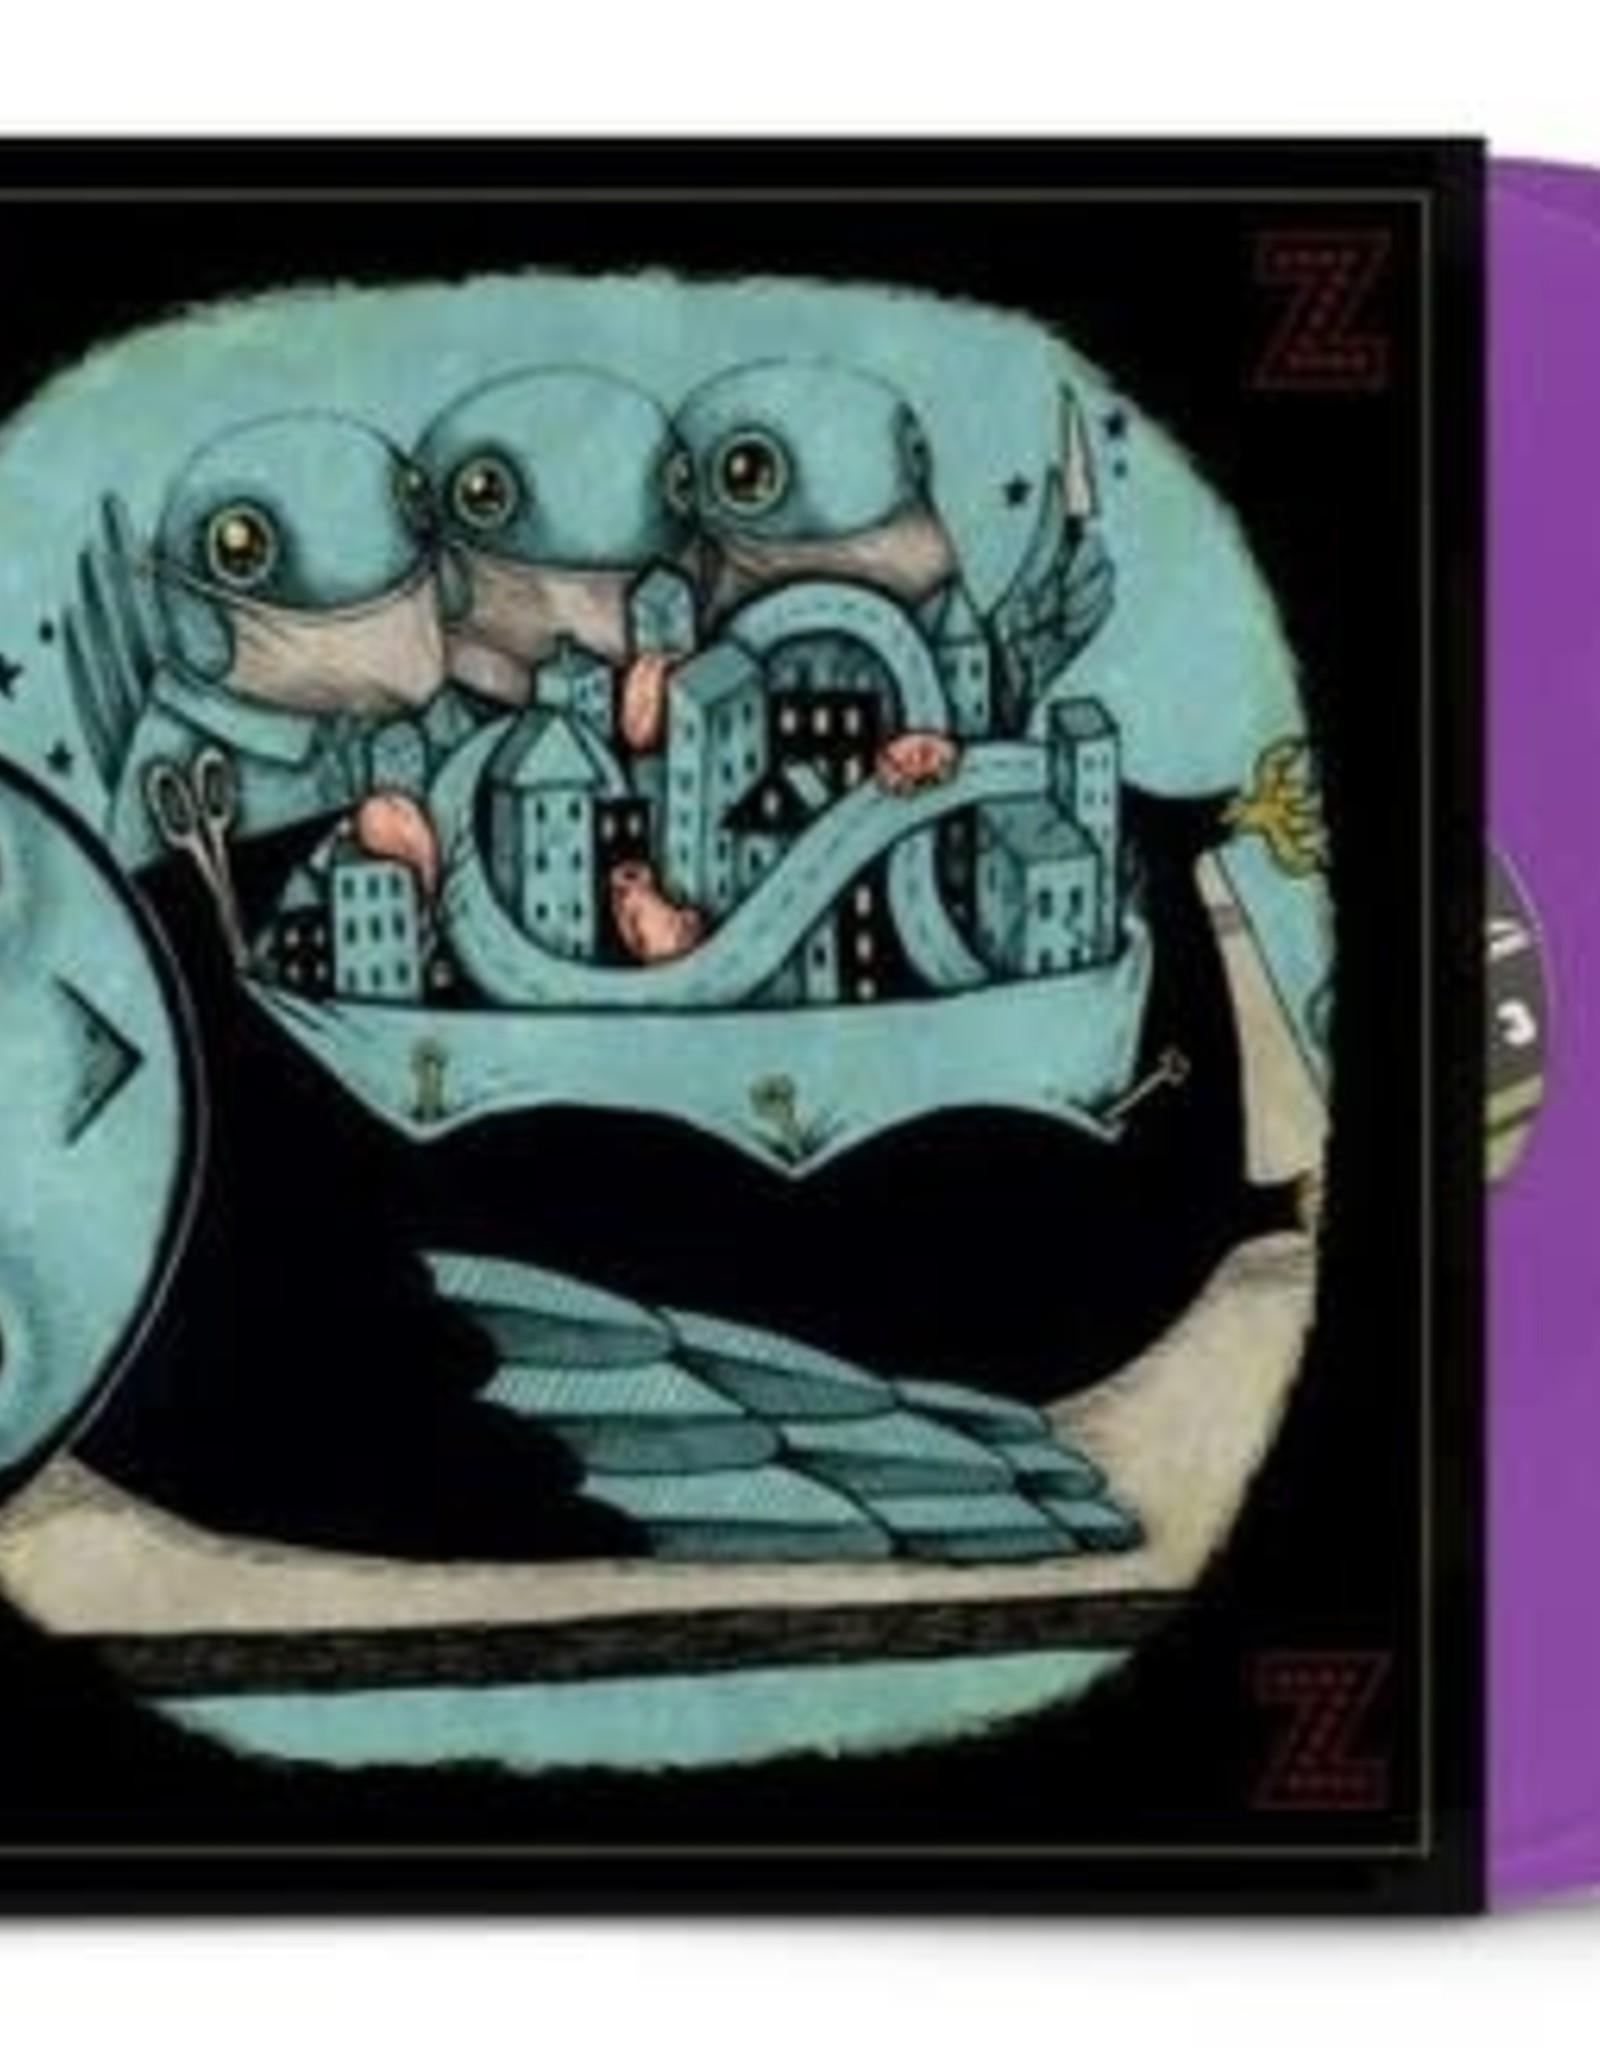 My Morning Jacket - Z (Purple Vinyl, Limited Edition, 180 Gram Vinyl, Reissue)